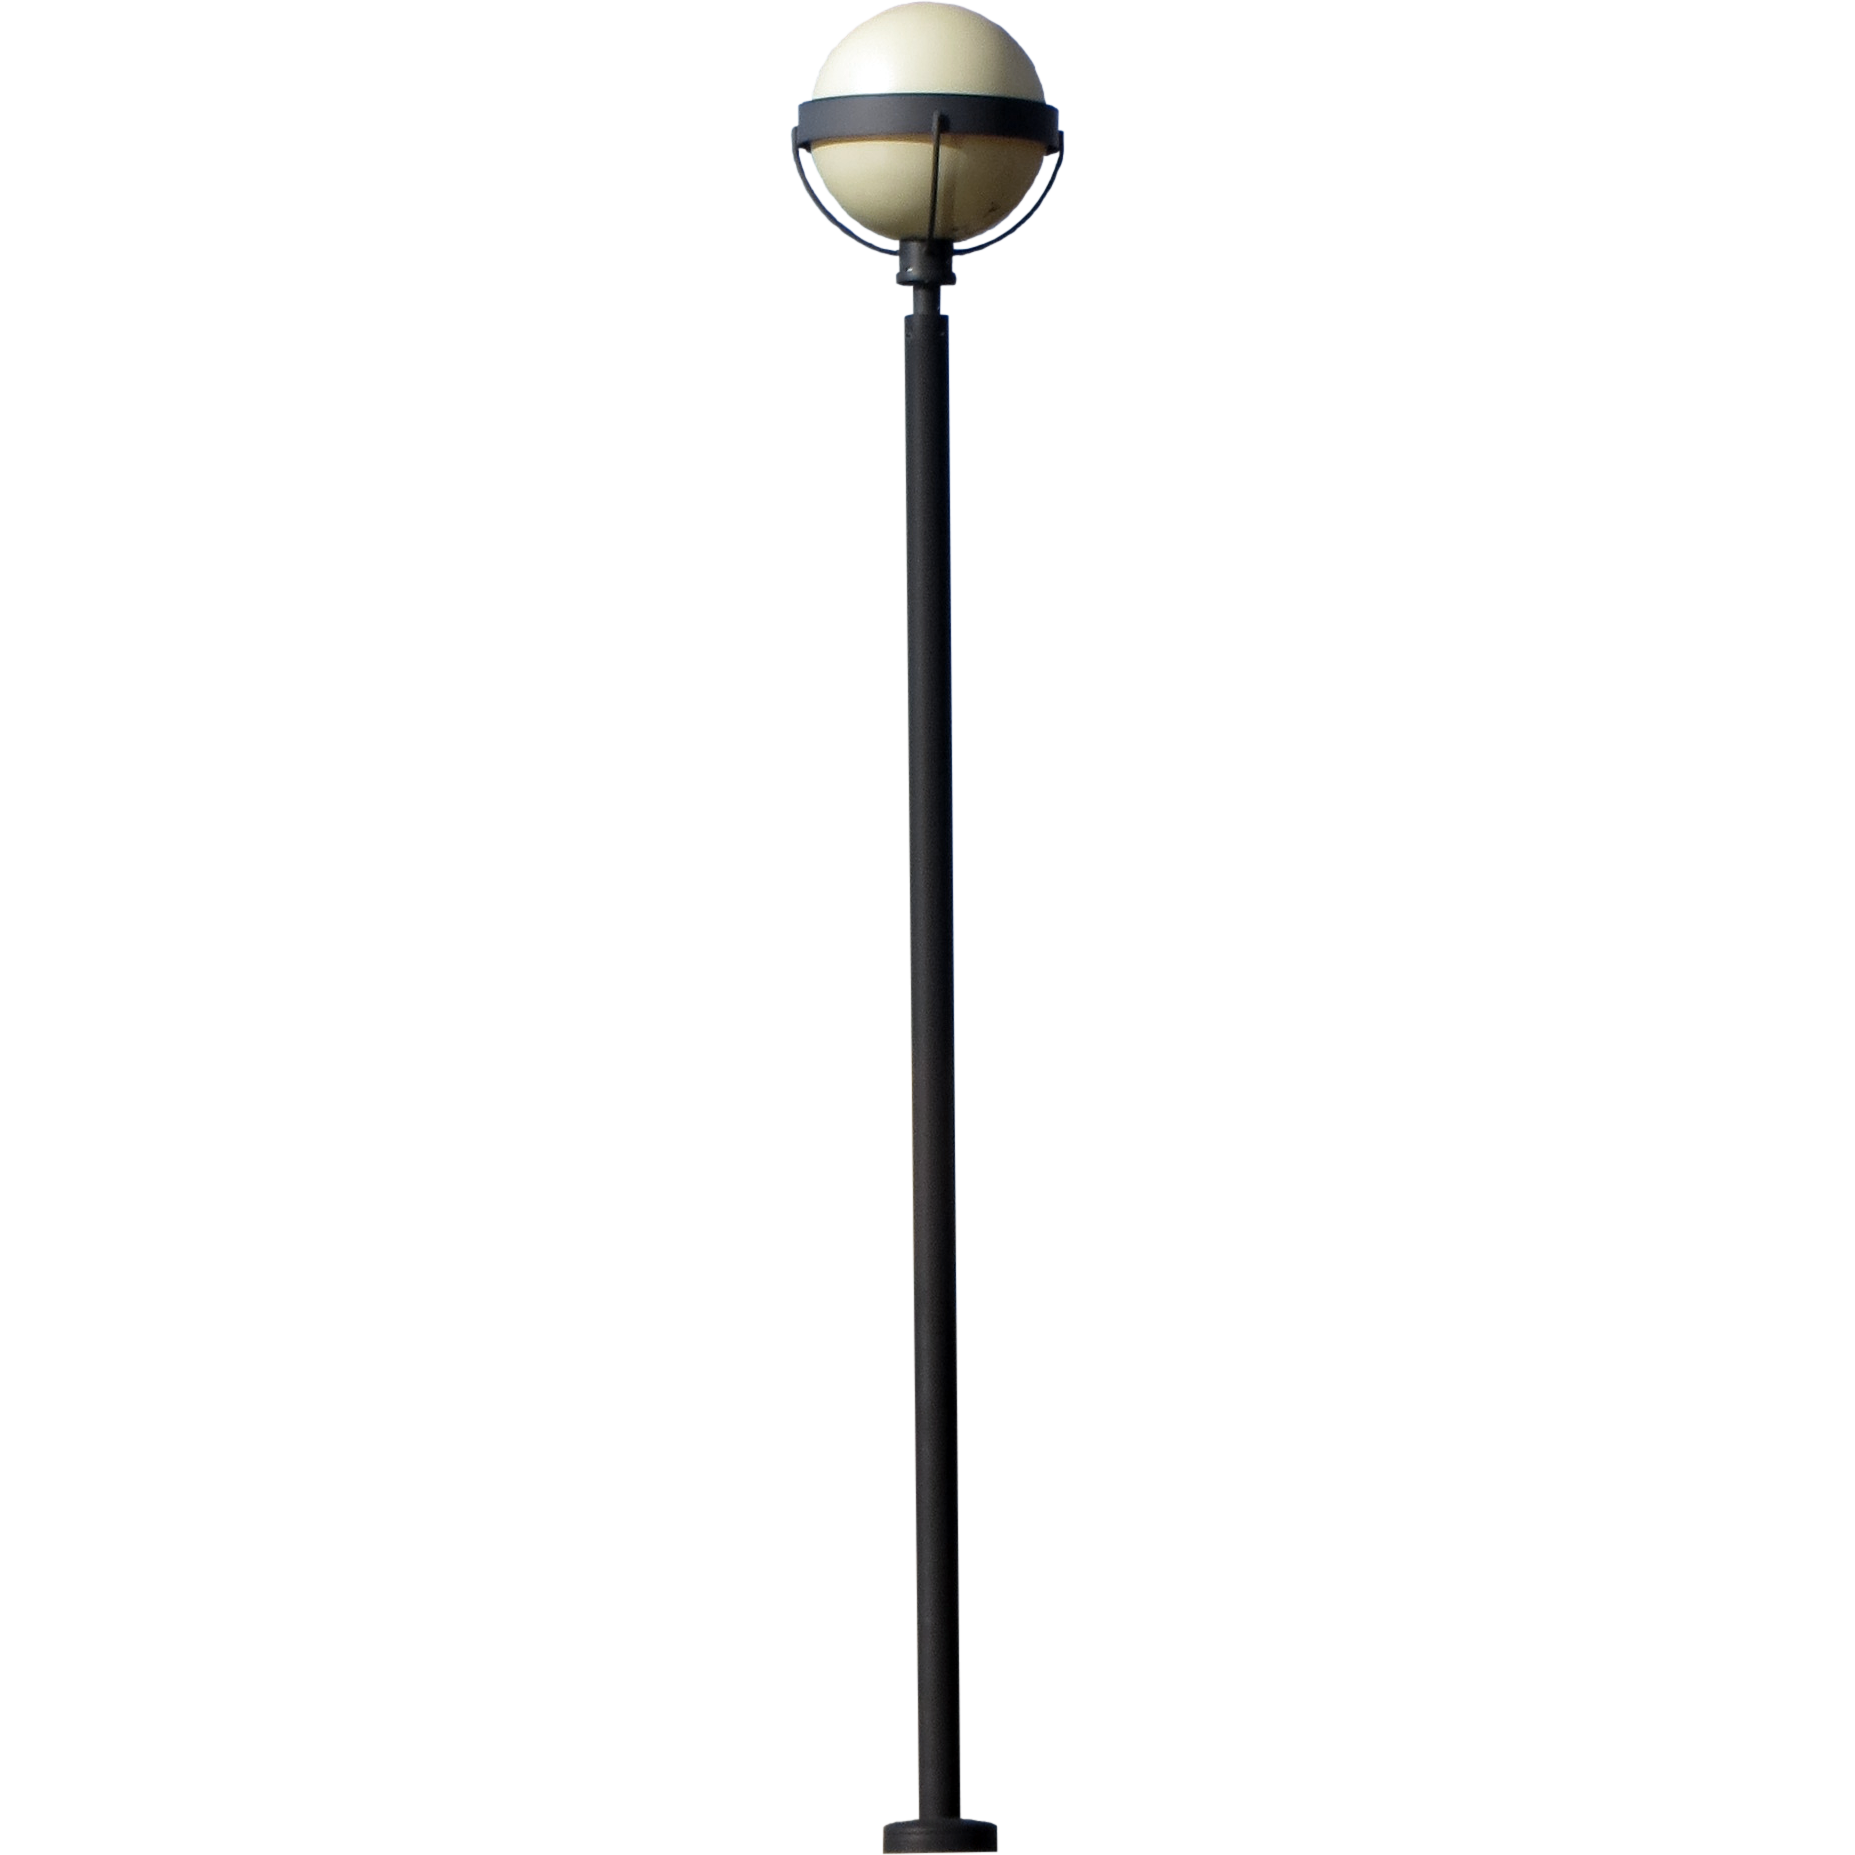 Streetlamp HD PNG - 119922